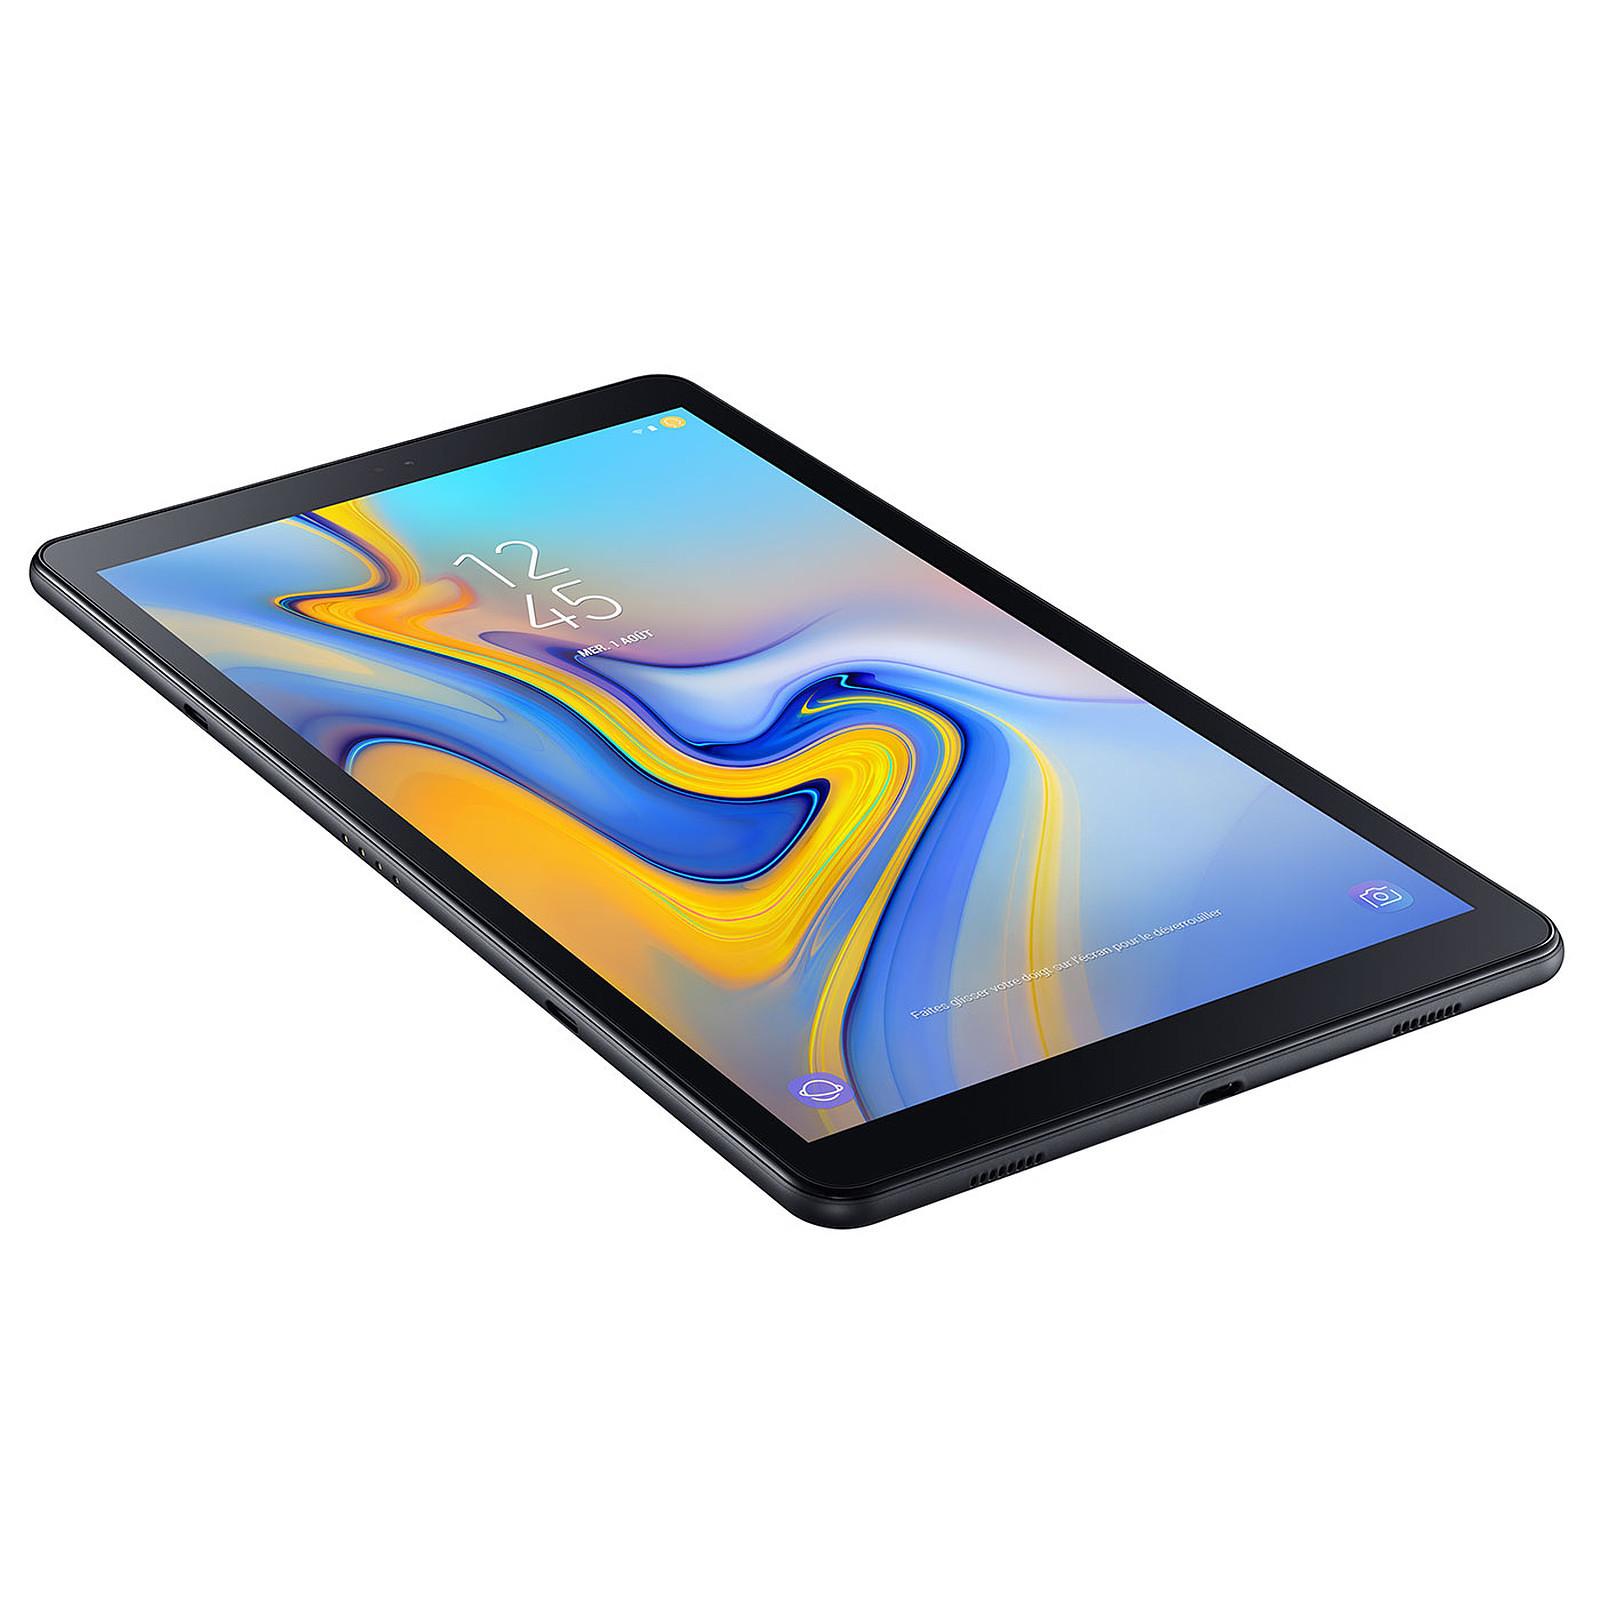 Galaxy Tab A (2018) 10.5 - T590 Coque / housse personnalisée